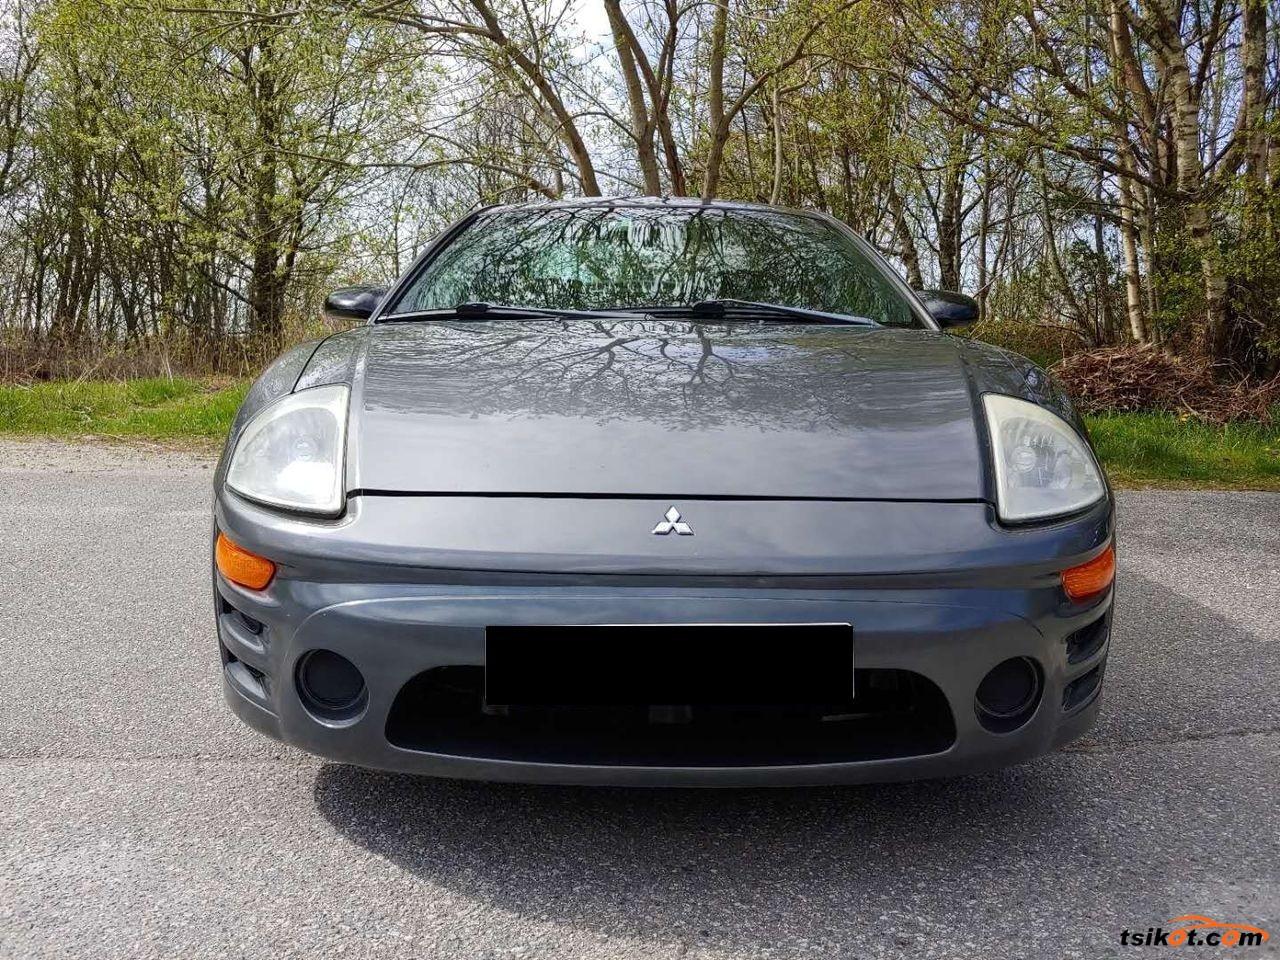 Mitsubishi Eclipse 2003 - 2